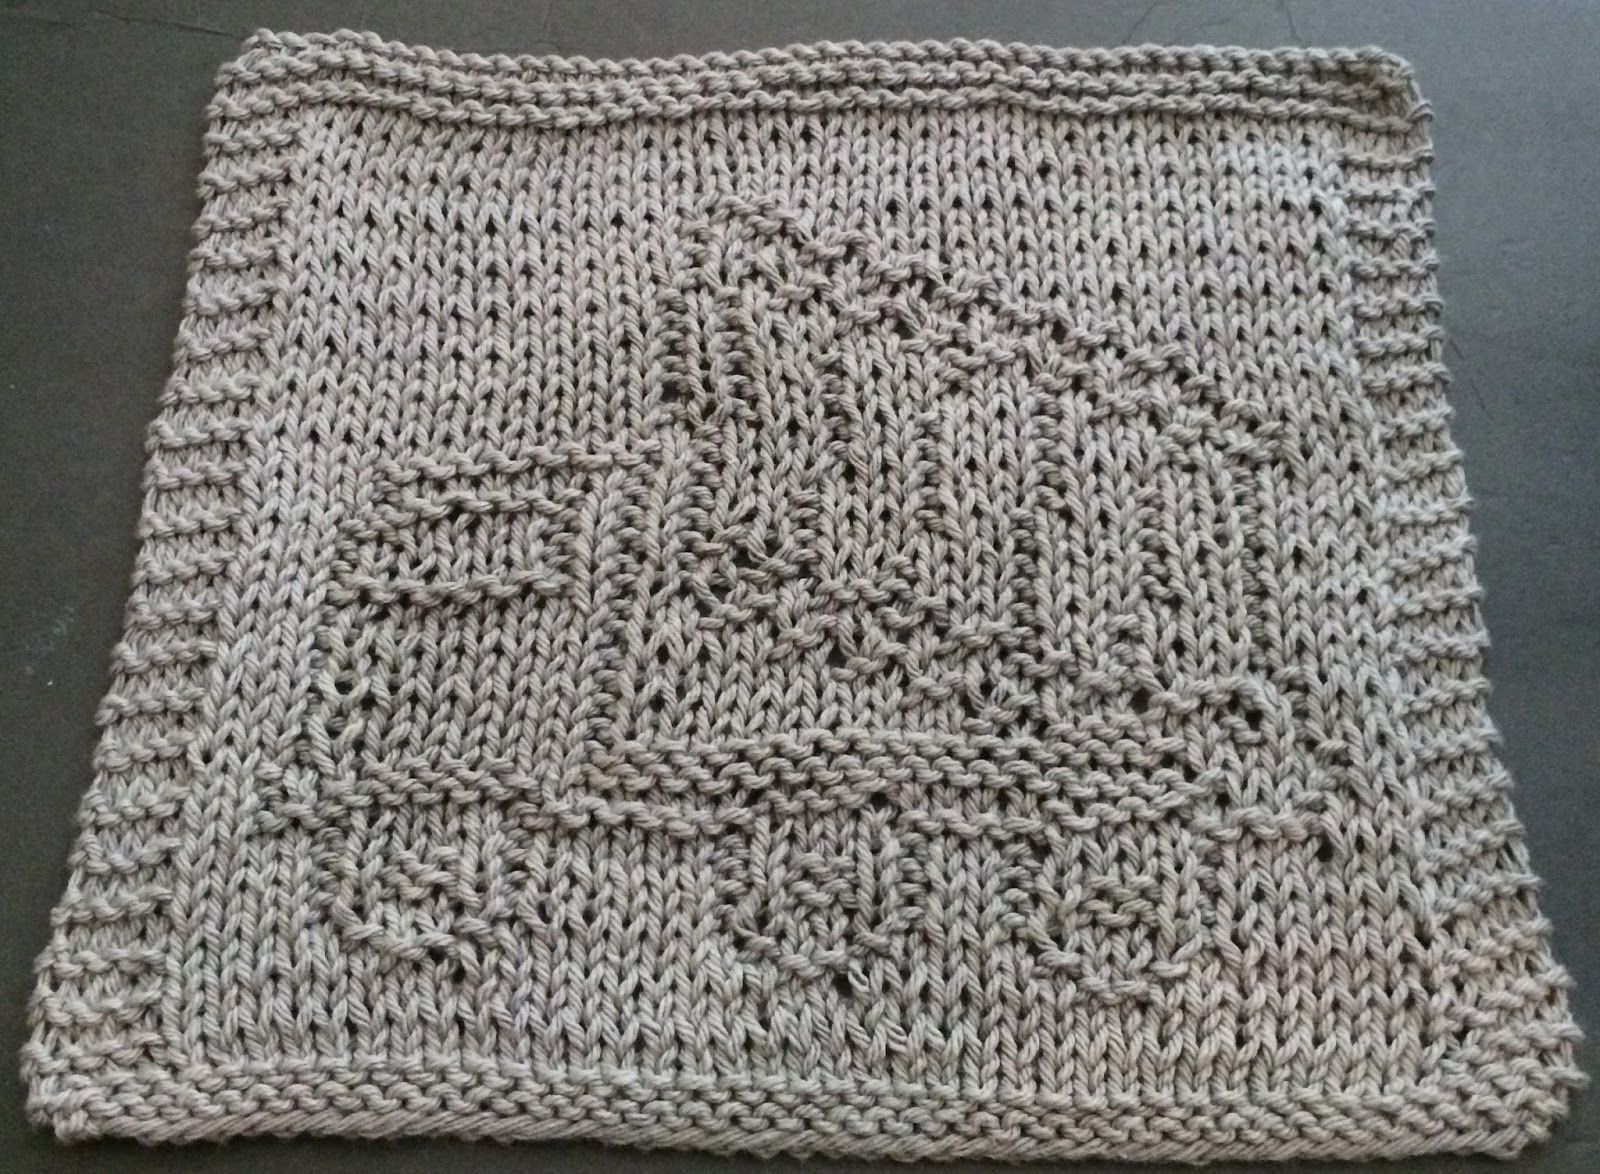 DigKnitty Designs: Dump Truck Knit Dishcloth Pattern | OES: Beginner ...